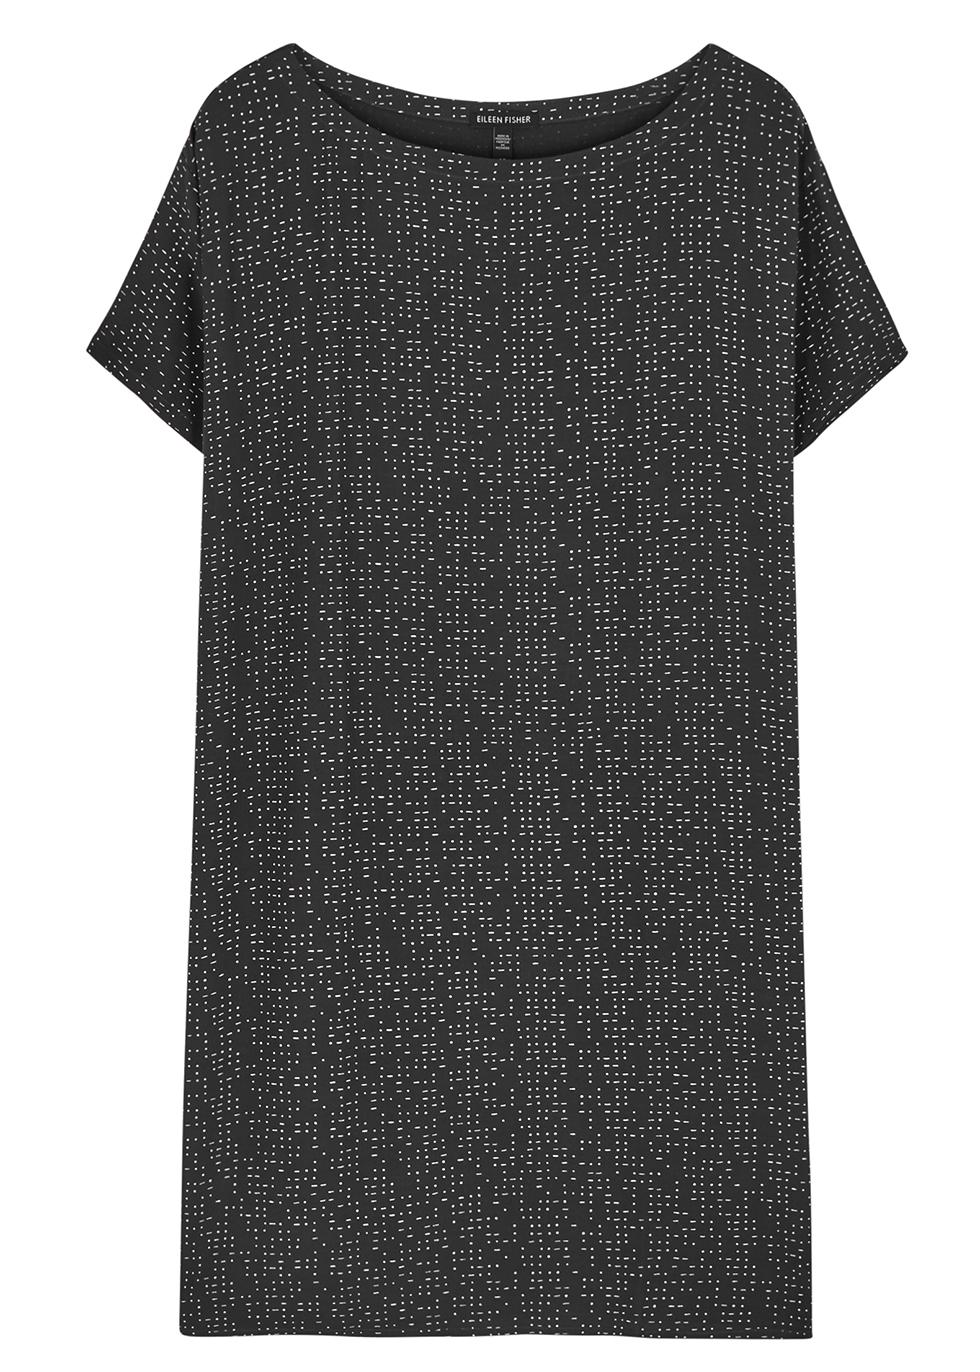 Grey printed crepe de chine dress - EILEEN FISHER